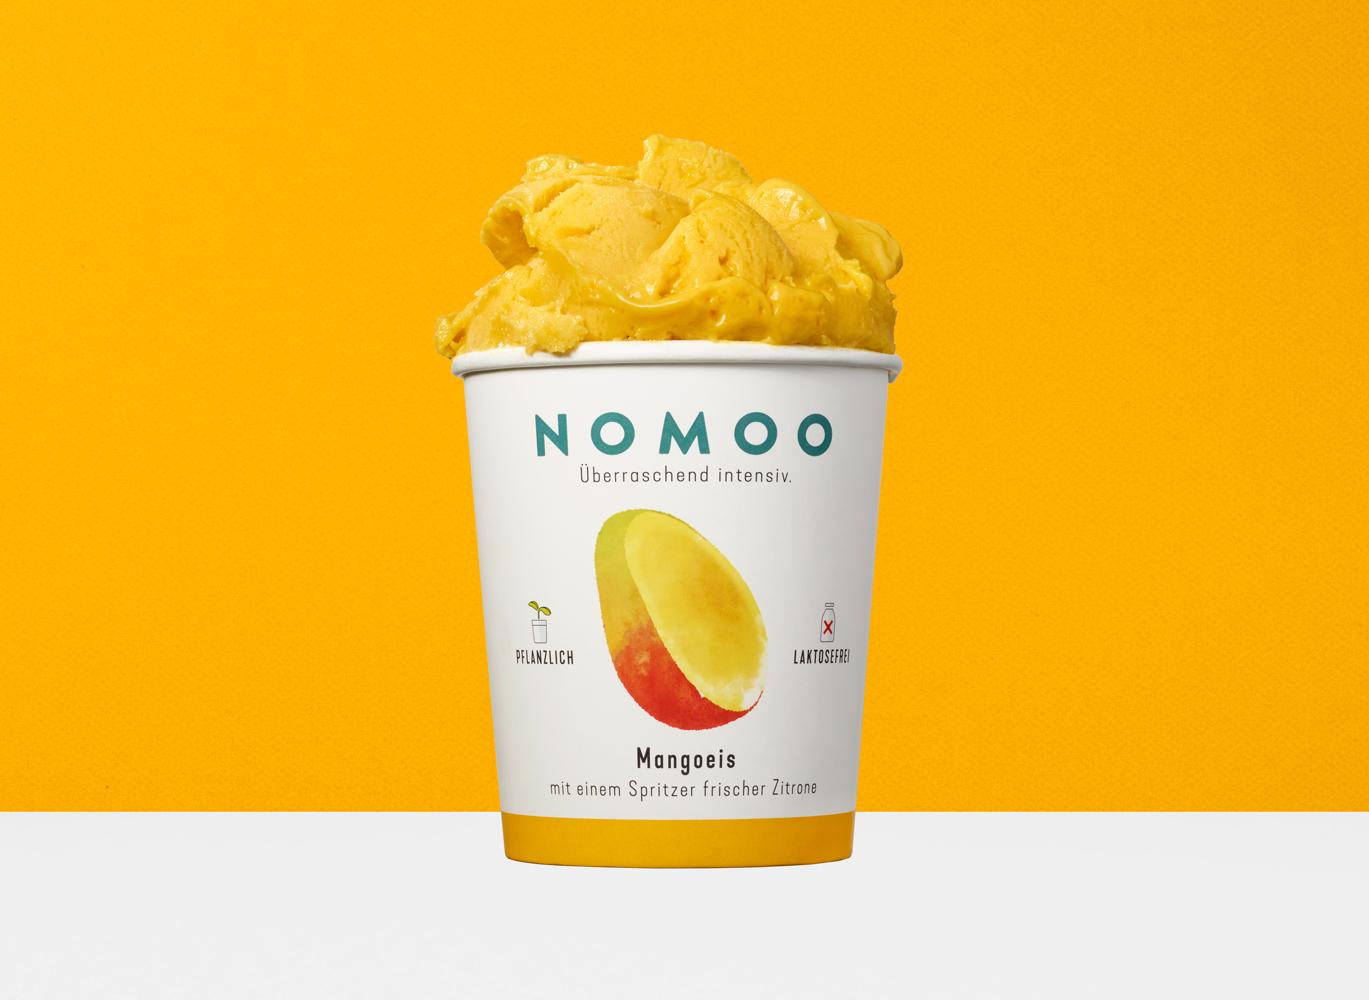 NOMOO-Mangoeis-1369w-1000h-RGB-100P-500ml.jpg